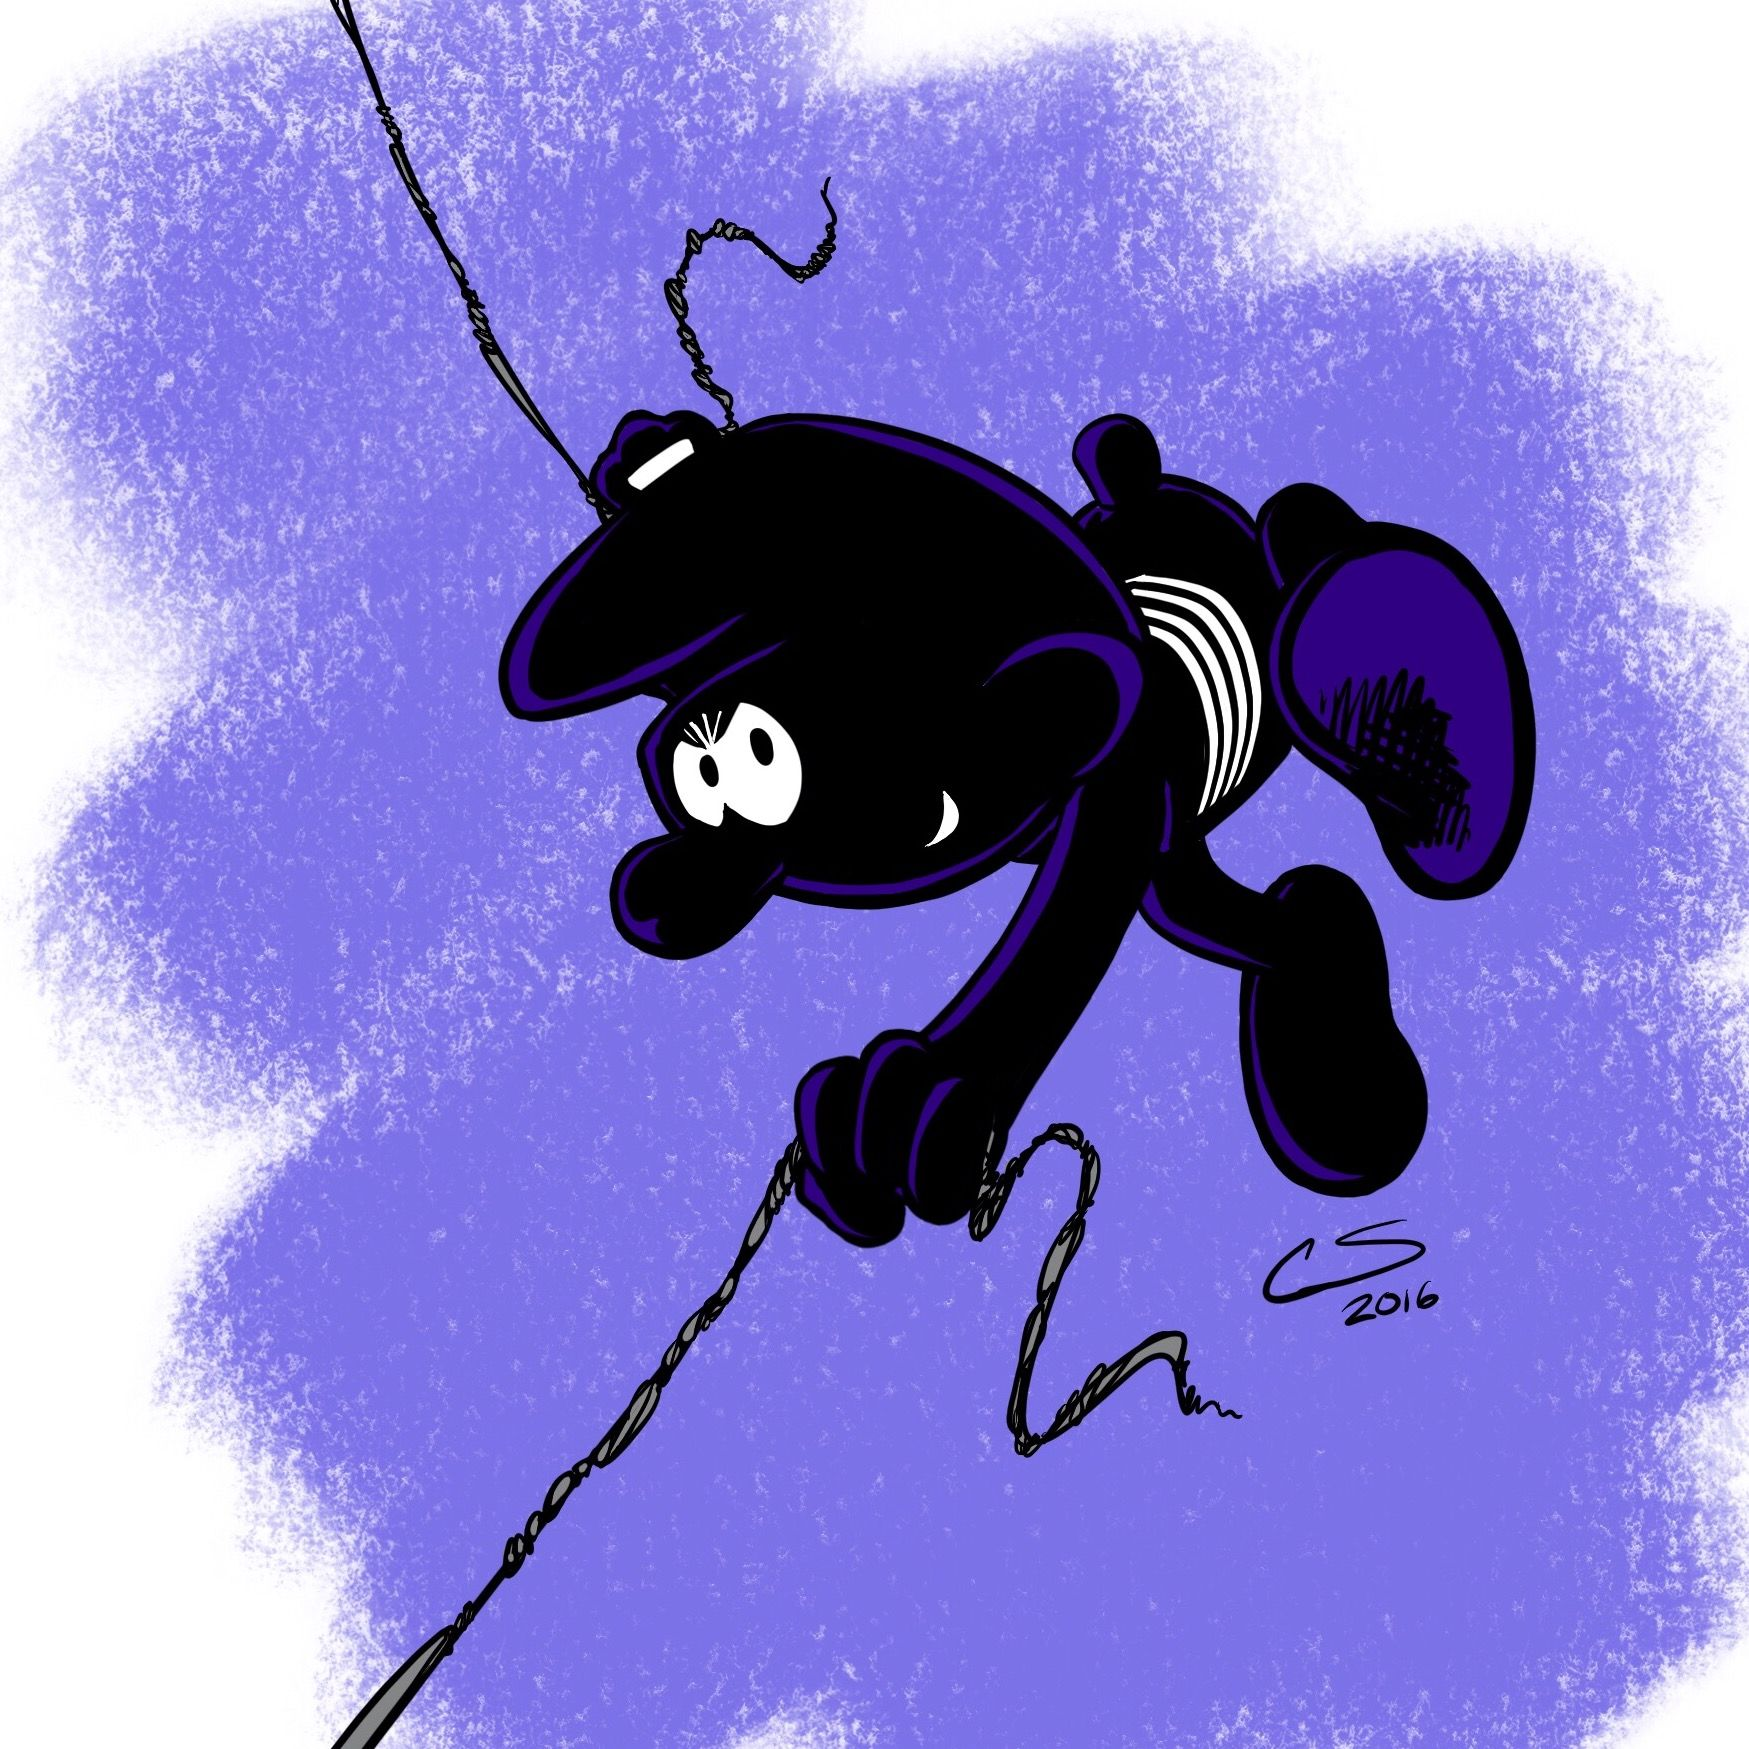 Spider-Smurf, Gnap Symbiote variant! Apologies to Peyo and Marvel ...